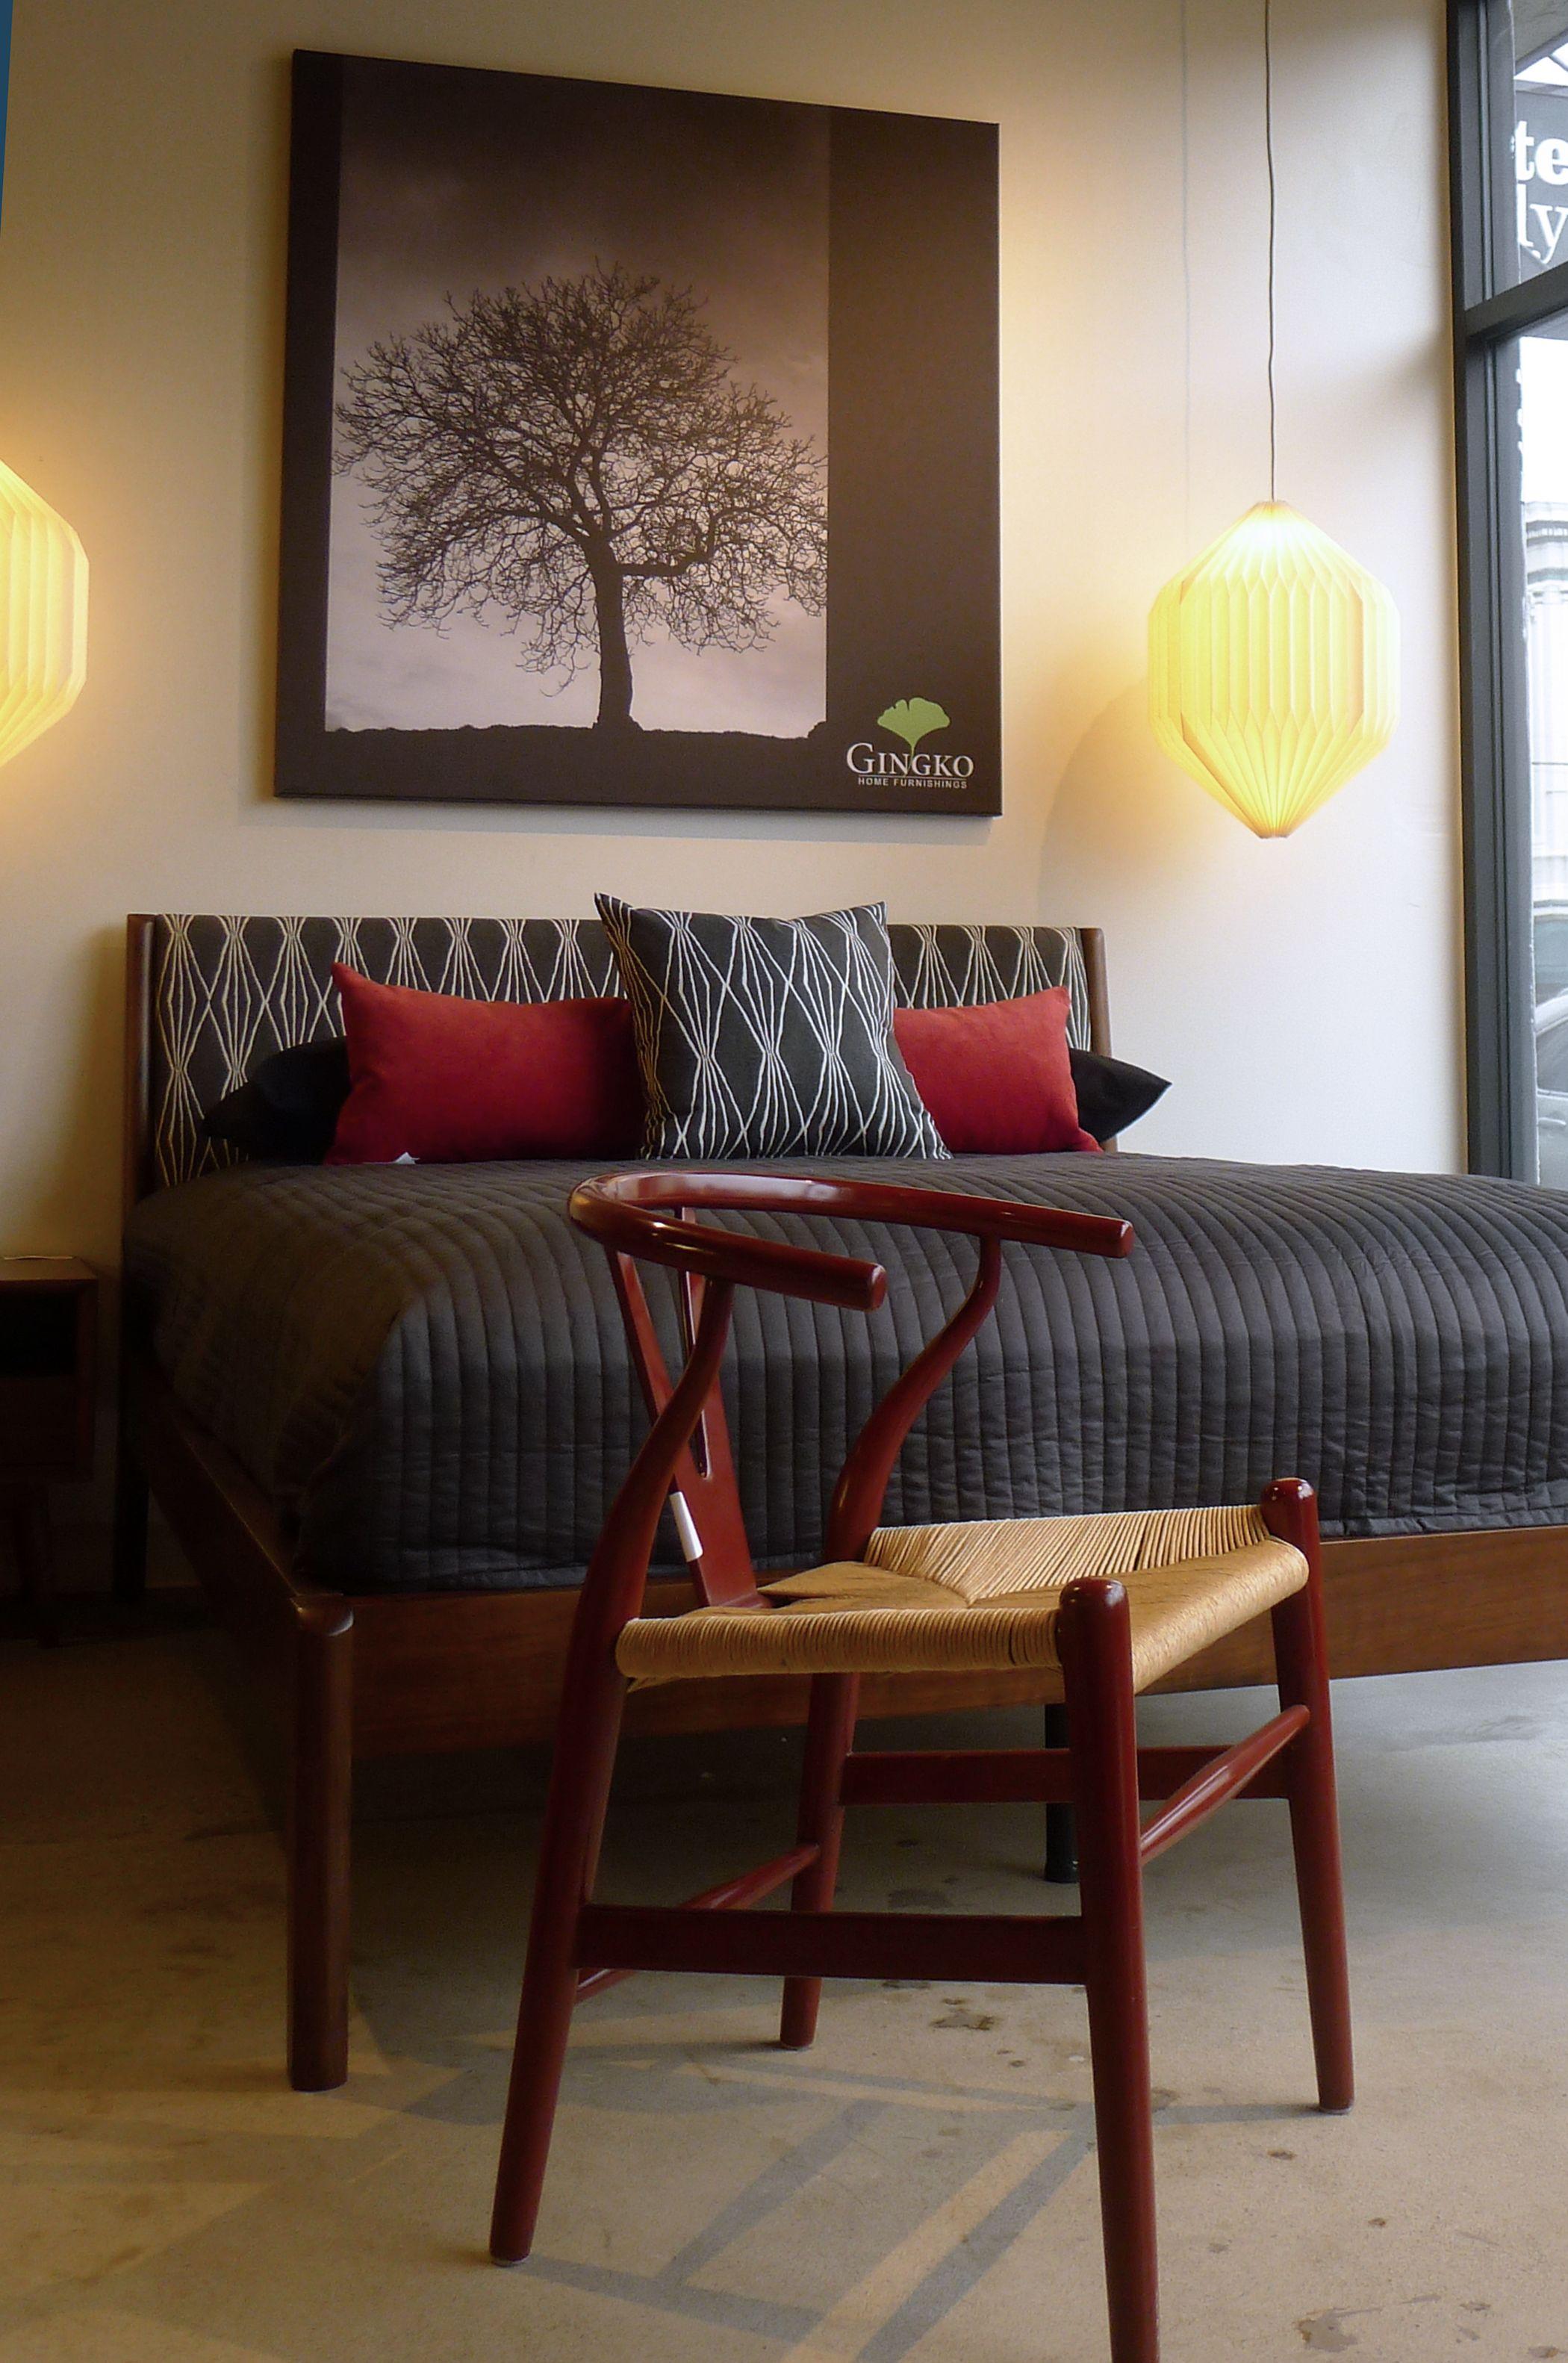 Best Lewis Bed Walnut Frame Upholstered Headboard Queen 400 x 300